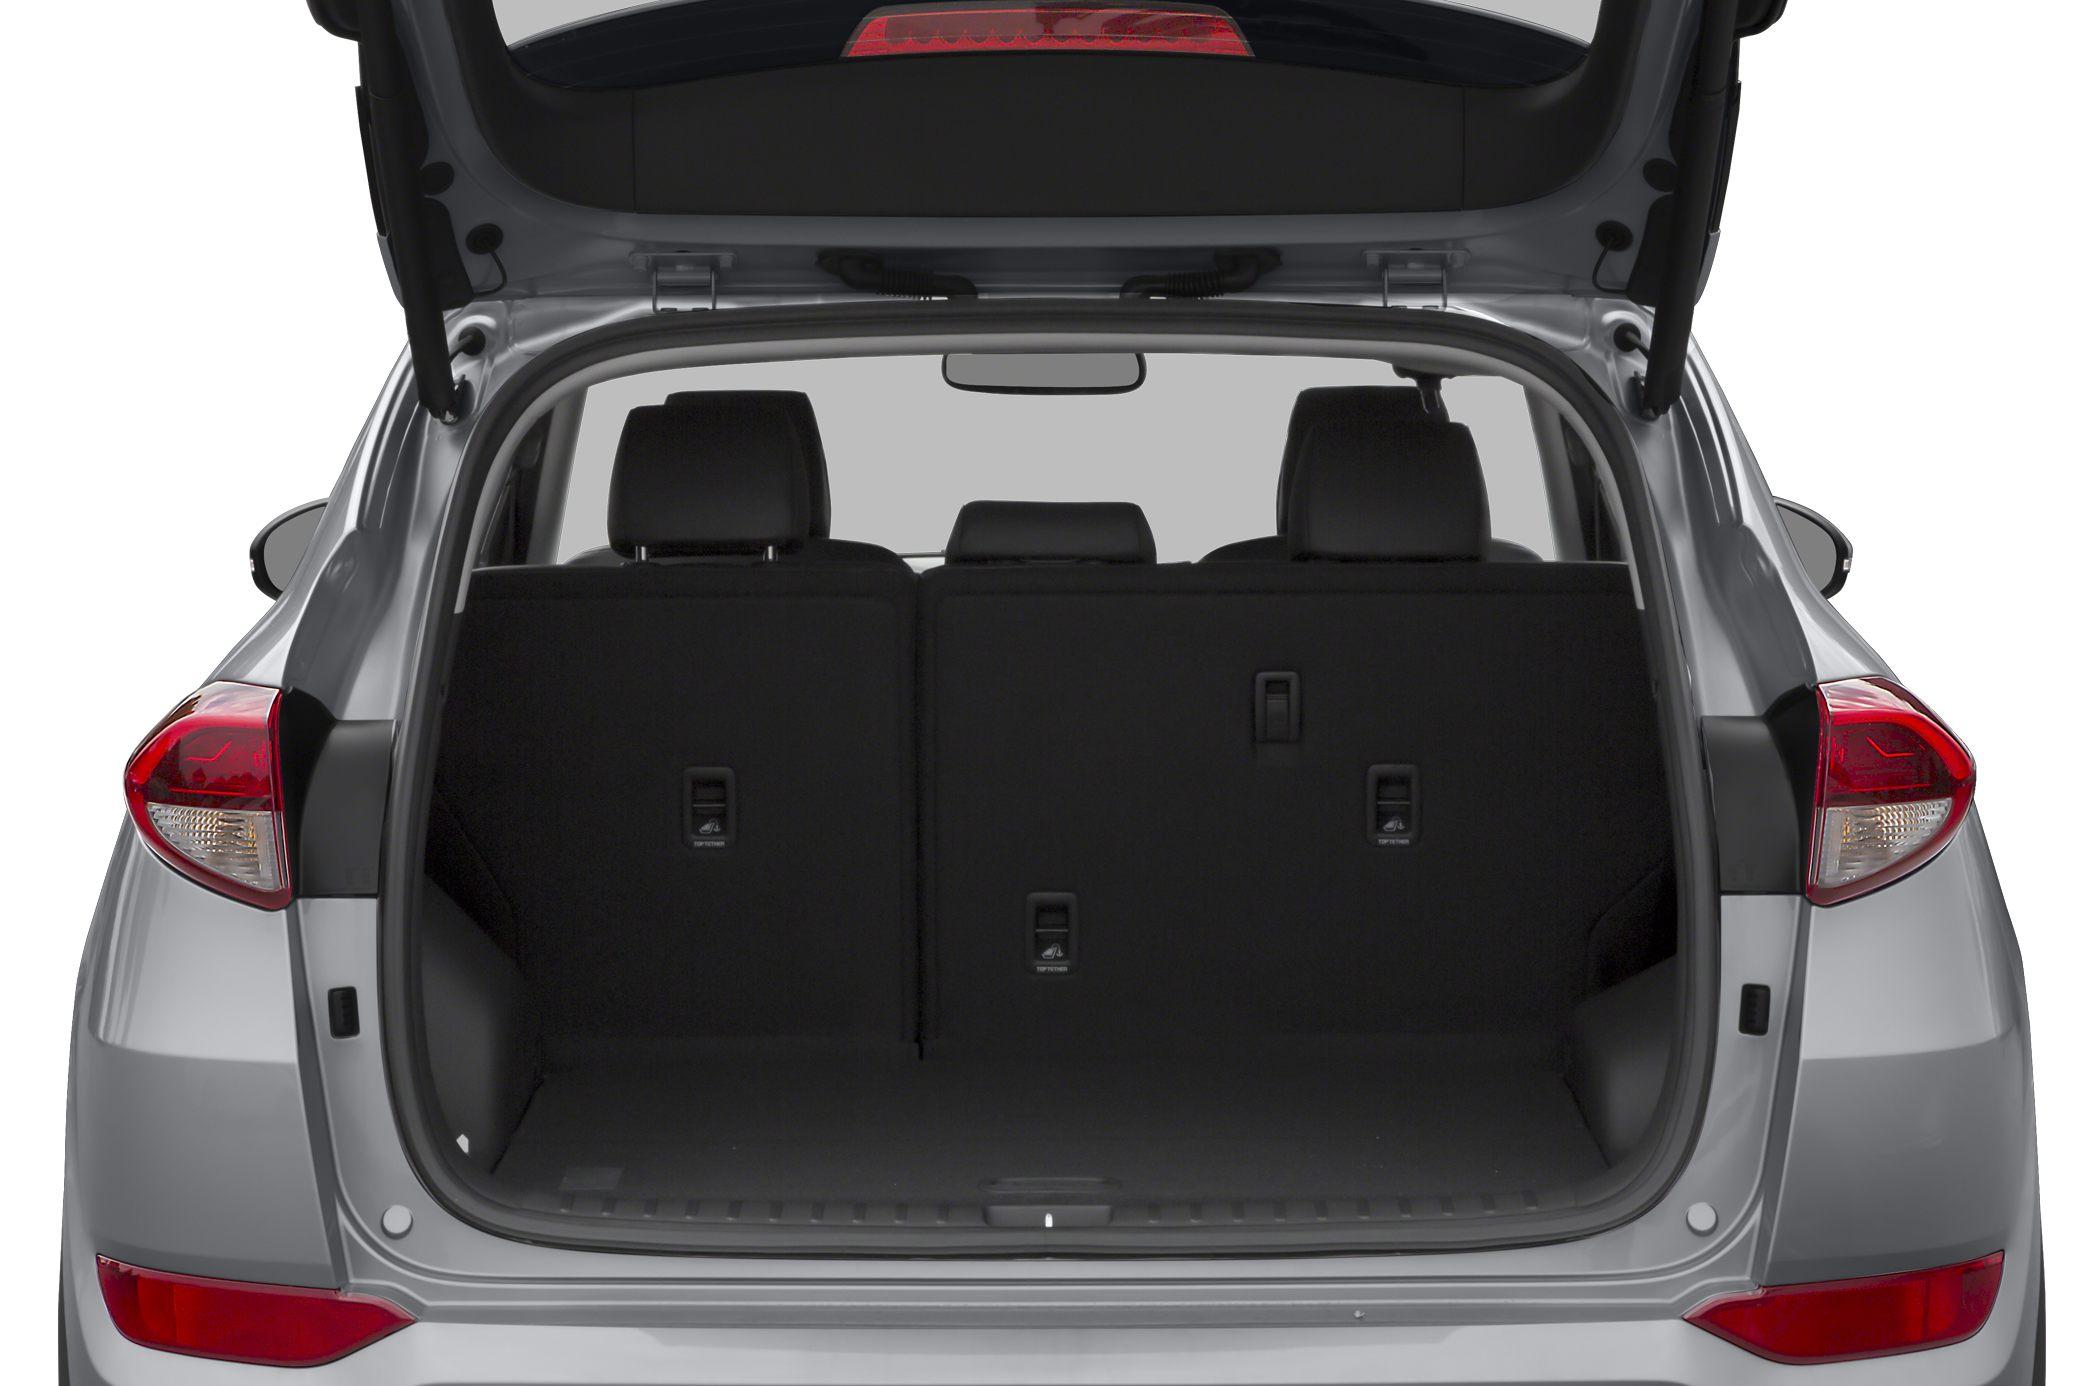 2017 Hyundai Tucson Reviews, Specs and Prices | Cars.com